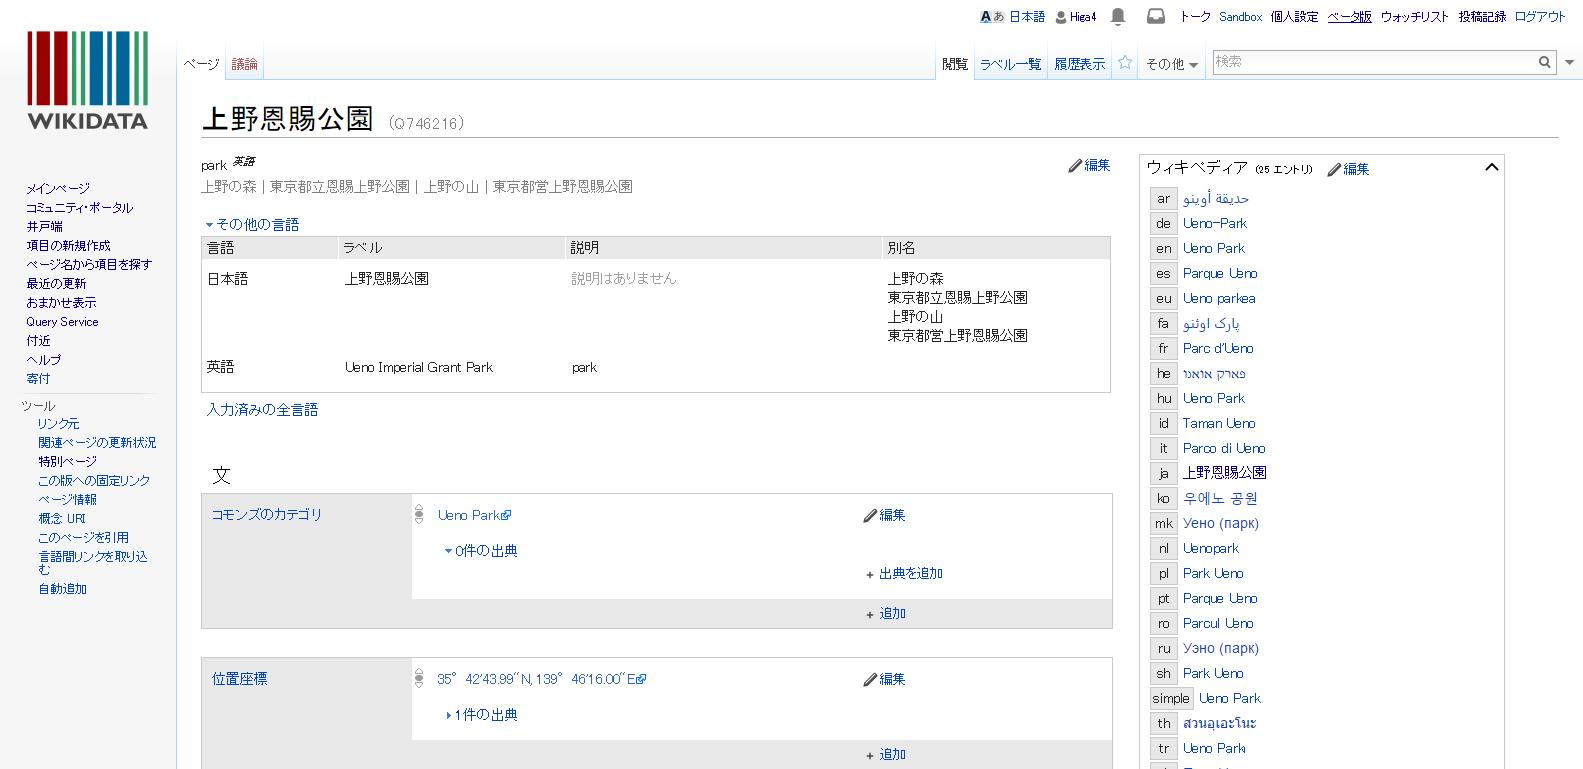 上野恩賜公園   Wikidata.png